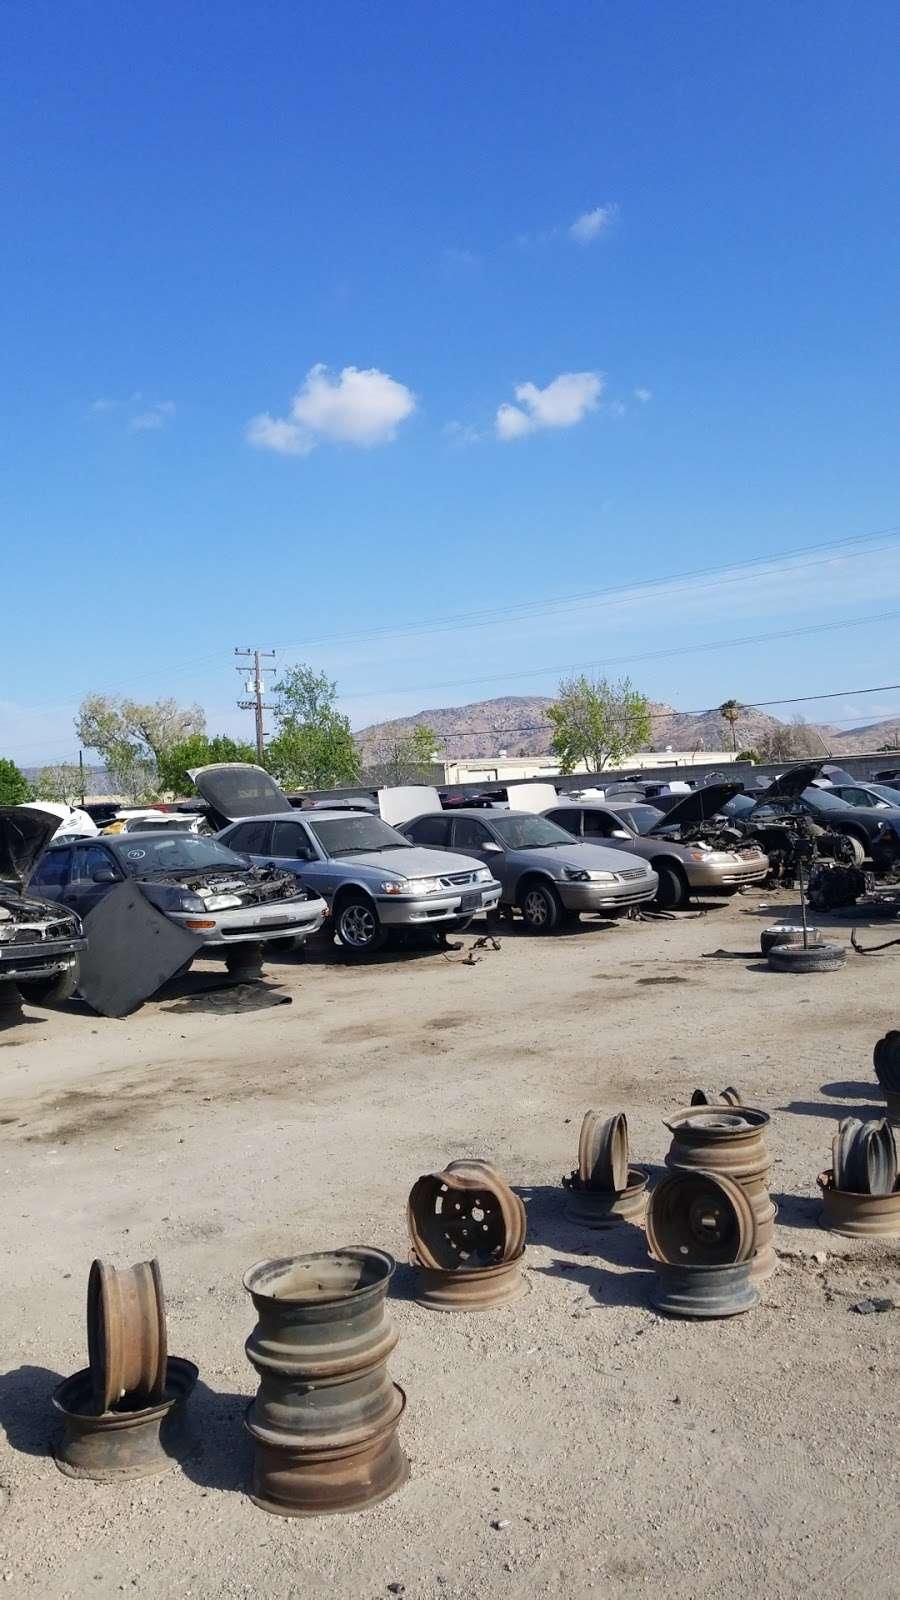 LKQ Pick Your Part - Fontana - car repair  | Photo 6 of 10 | Address: 15228 Boyle Ave, Fontana, CA 92337, USA | Phone: (800) 962-2277